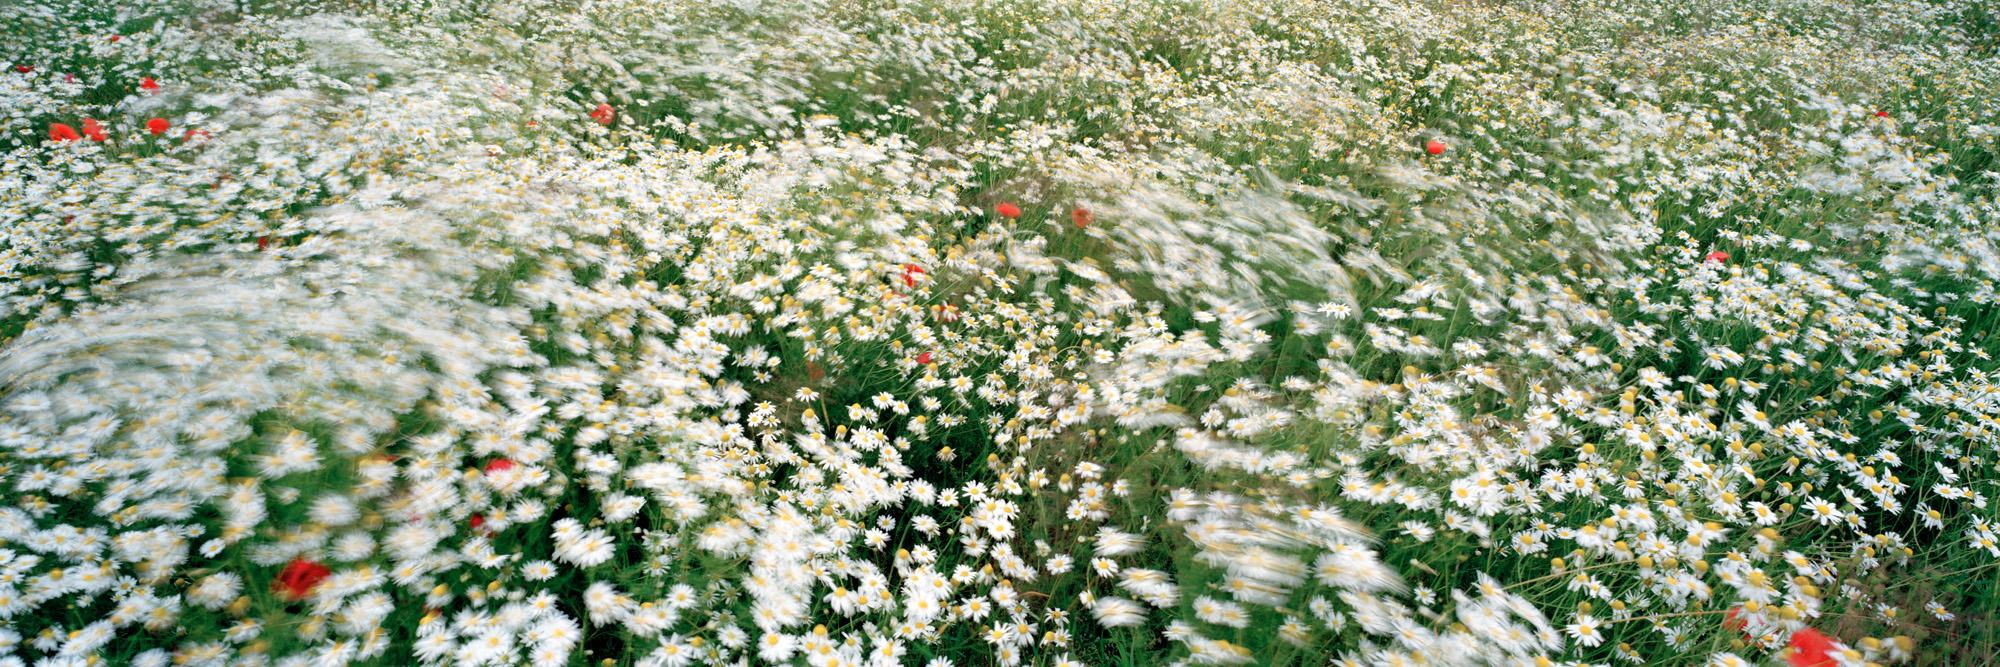 Brachland, Landschaft, Natur, analoge Fotografie, Großformat, Panoramafotografie, Markus Bollen, 6x17, grün, Leben, Wachstum, Frieden, Ruhe, Bewegung, Langzeitbelichtung